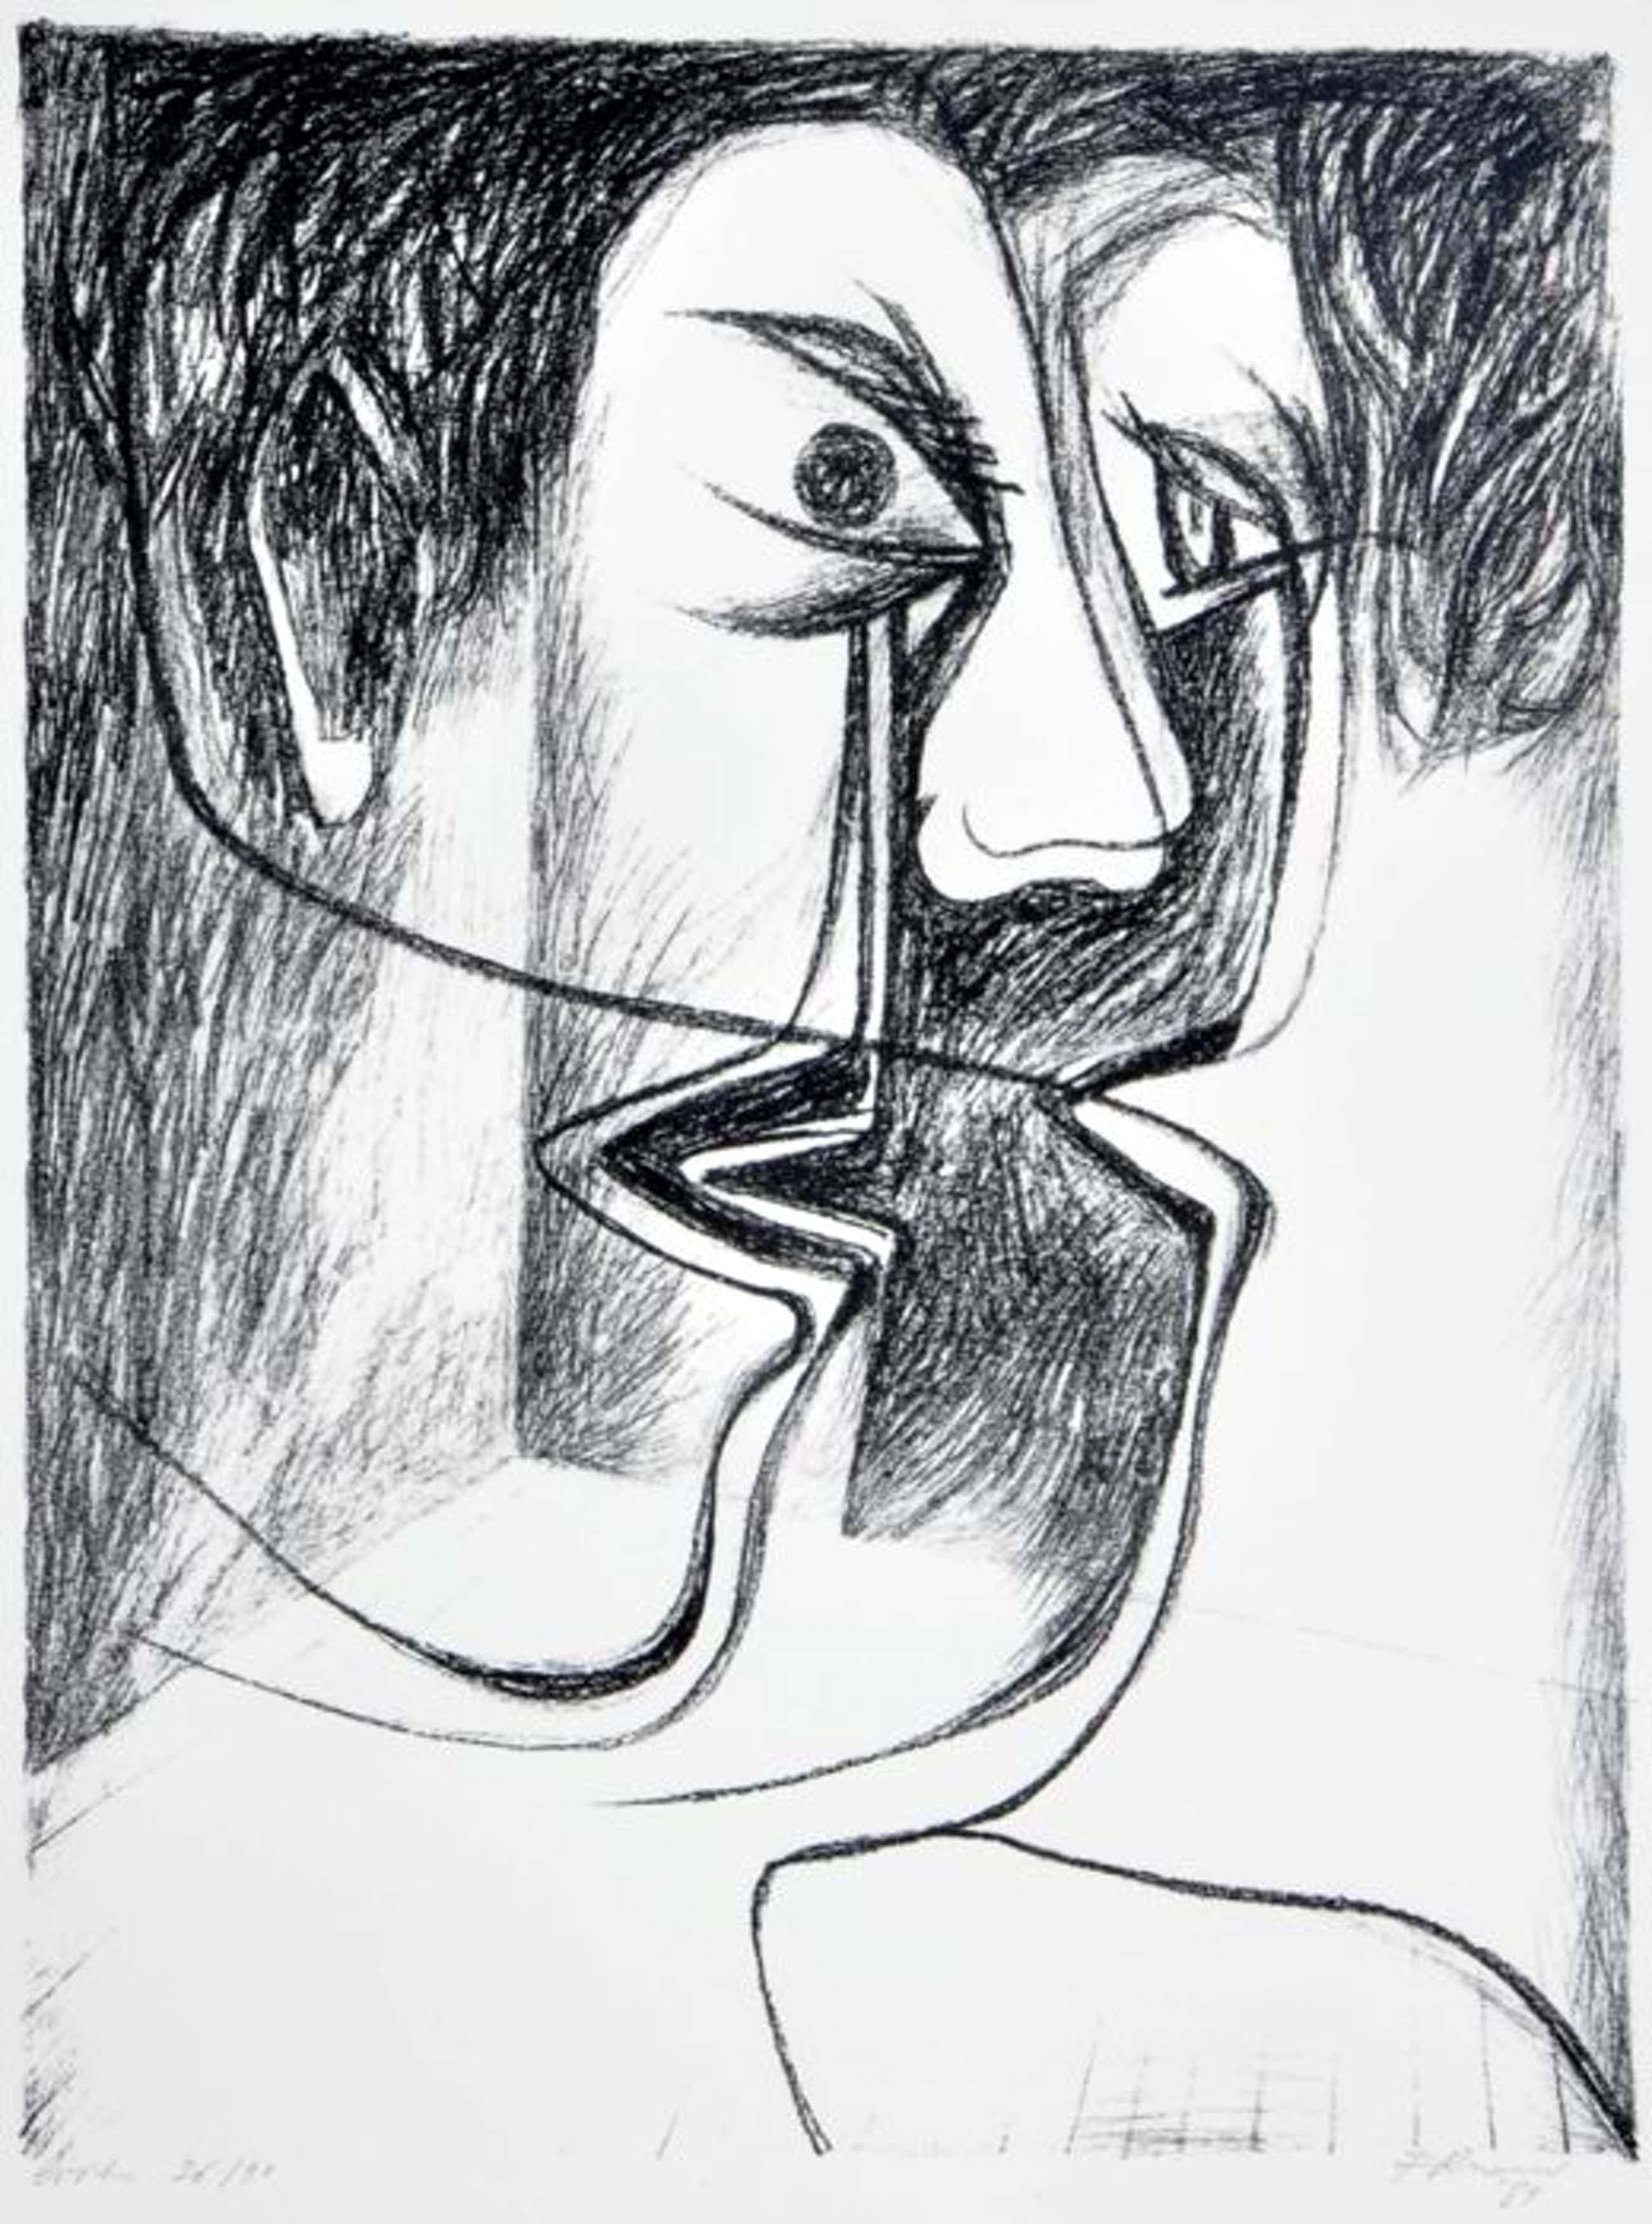 Cyr Frimout - Gesigneerde lithografie - 36/90 - 1989 kopen? Bied vanaf 35!